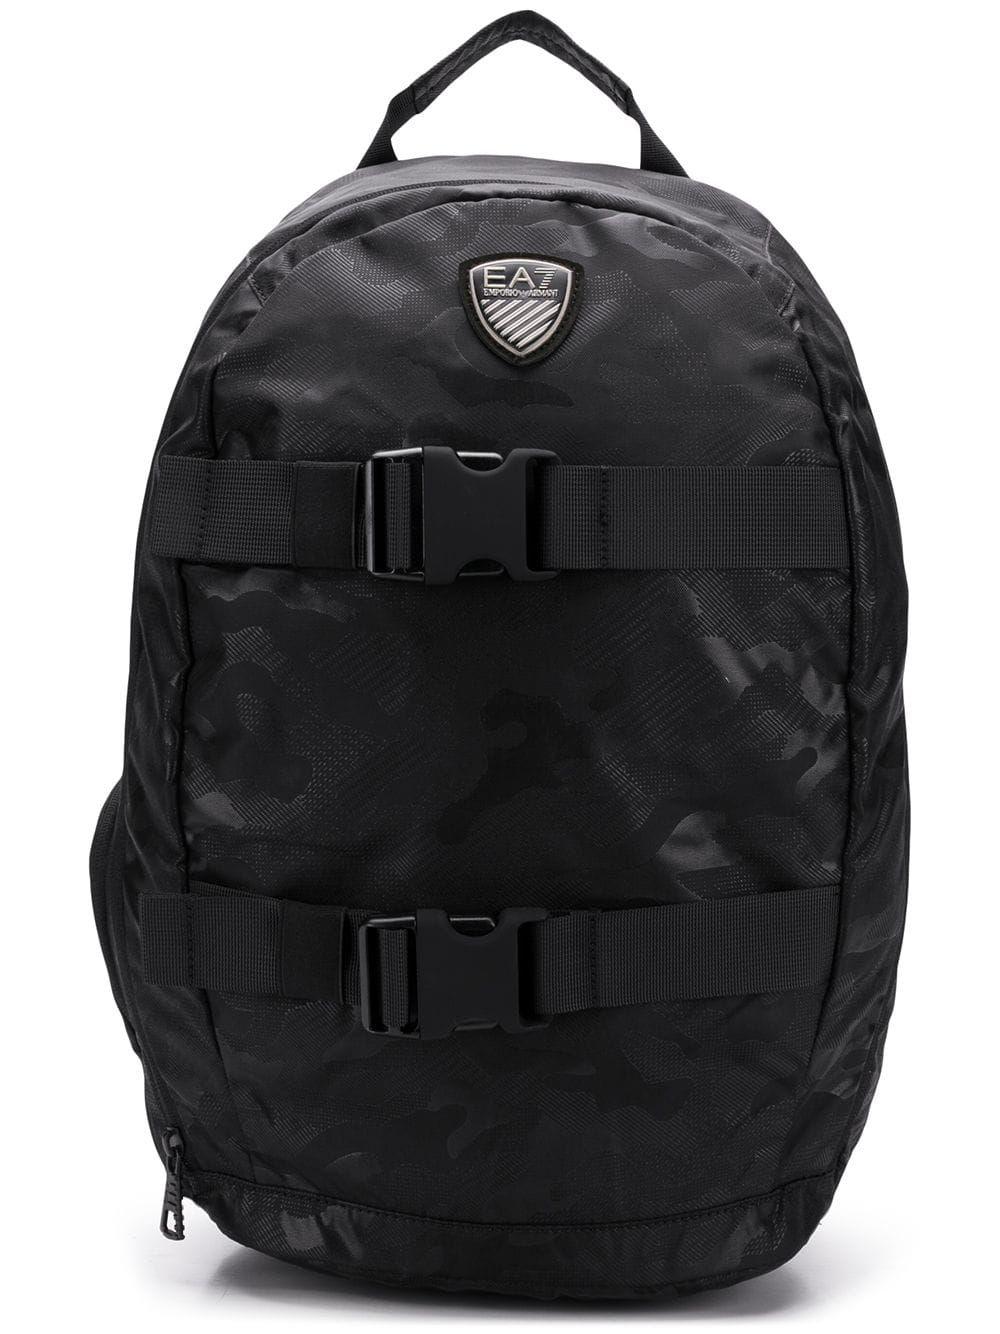 8d5fd4fcc264 EA7 EMPORIO ARMANI EA7 EMPORIO ARMANI LOGO PATCH BACKPACK - BLACK.   ea7emporioarmani  bags